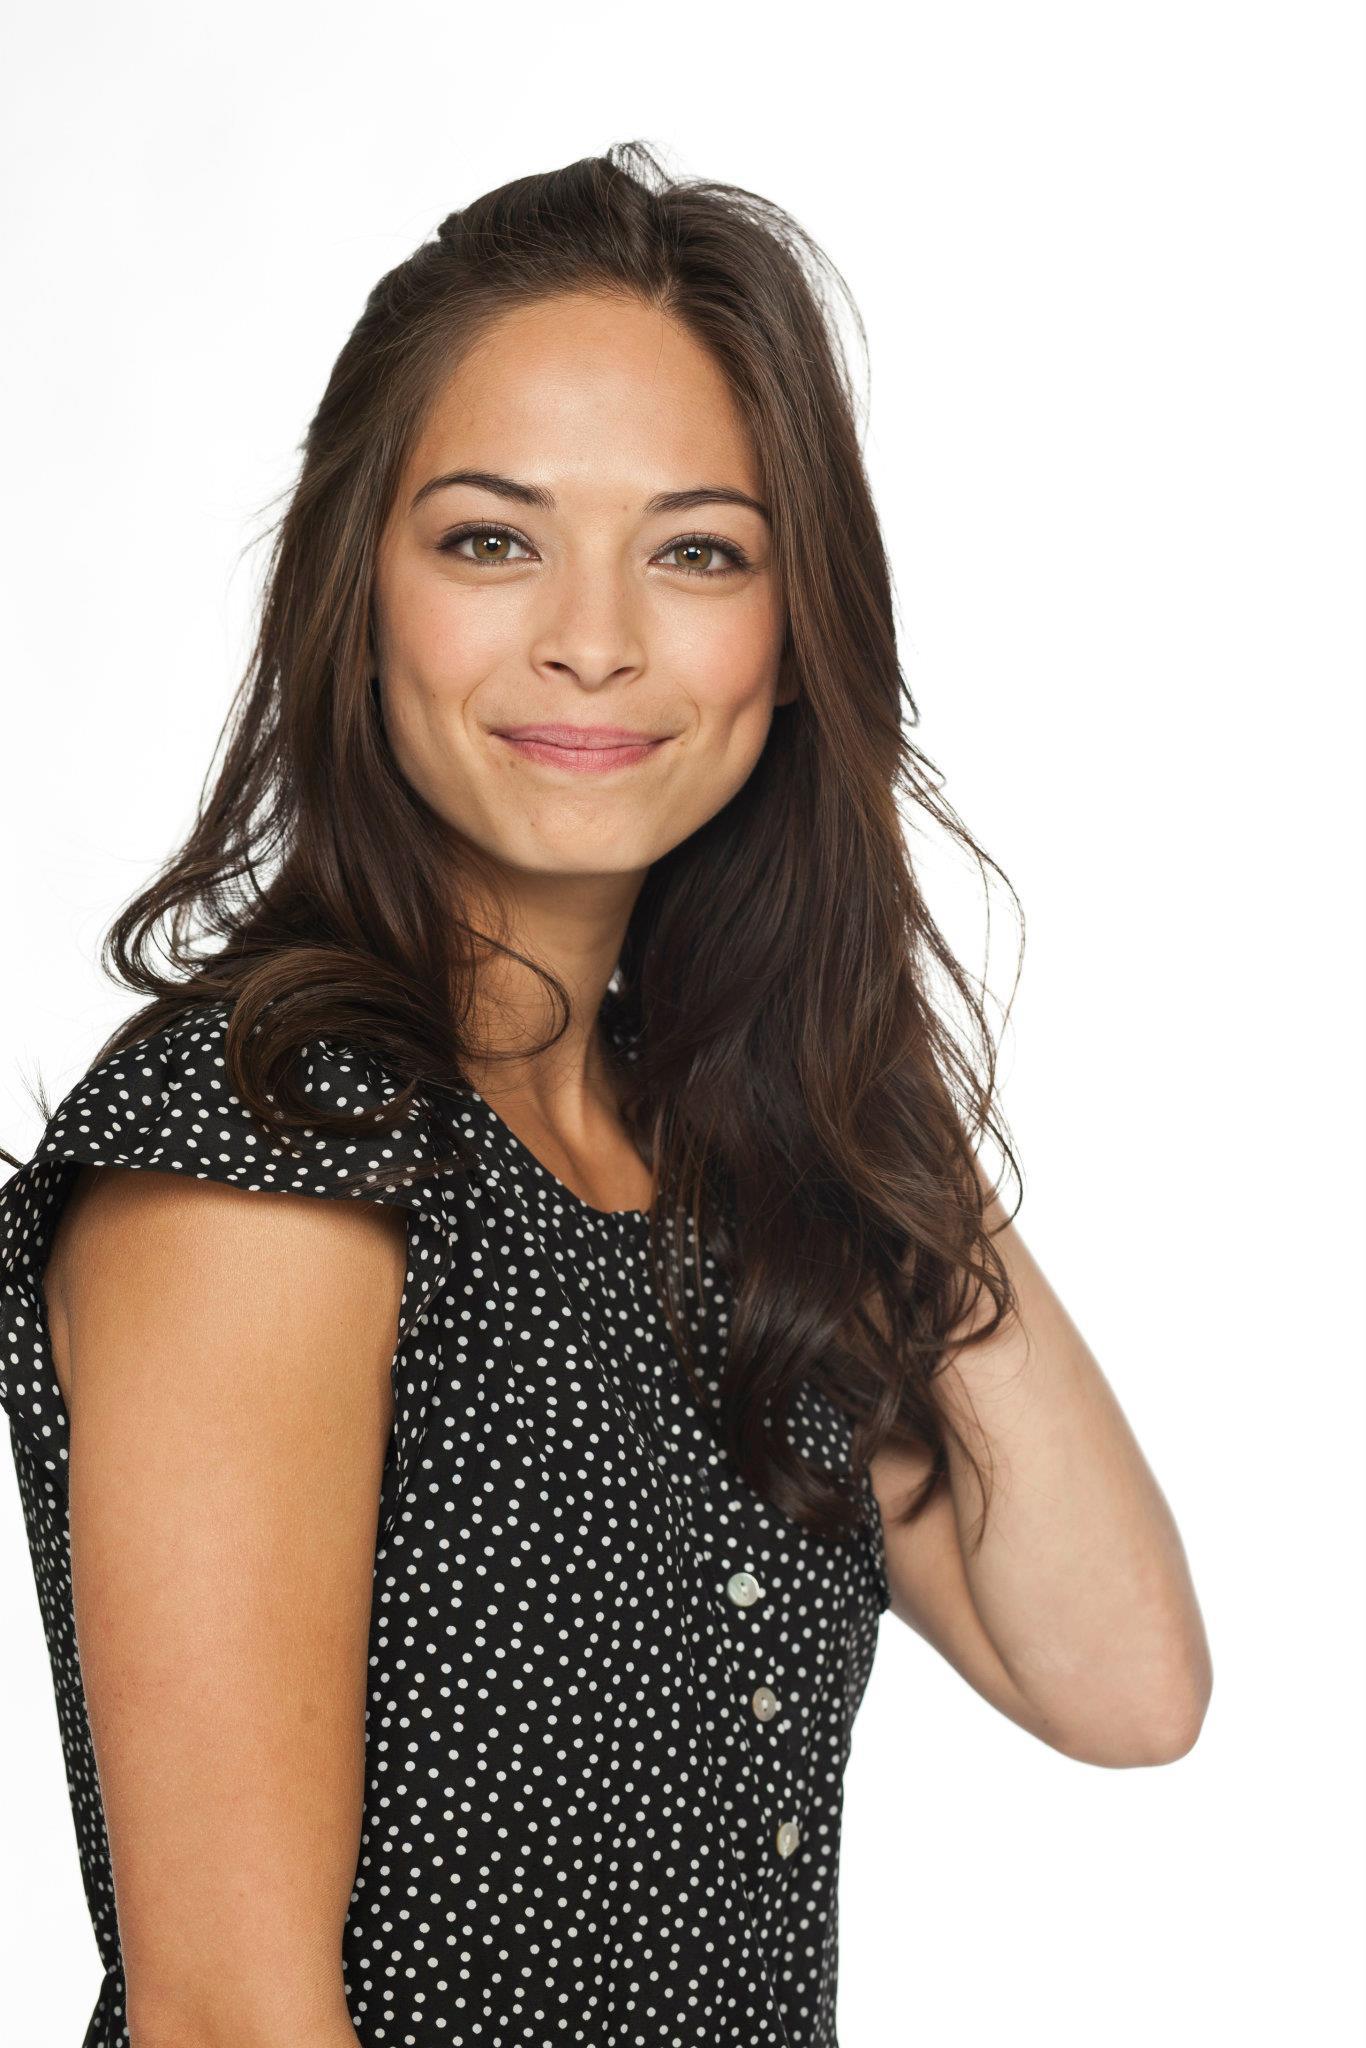 Monte Carlo 2015 >> Digitalminx.com - Actresses - Kristin Kreuk - Page 1